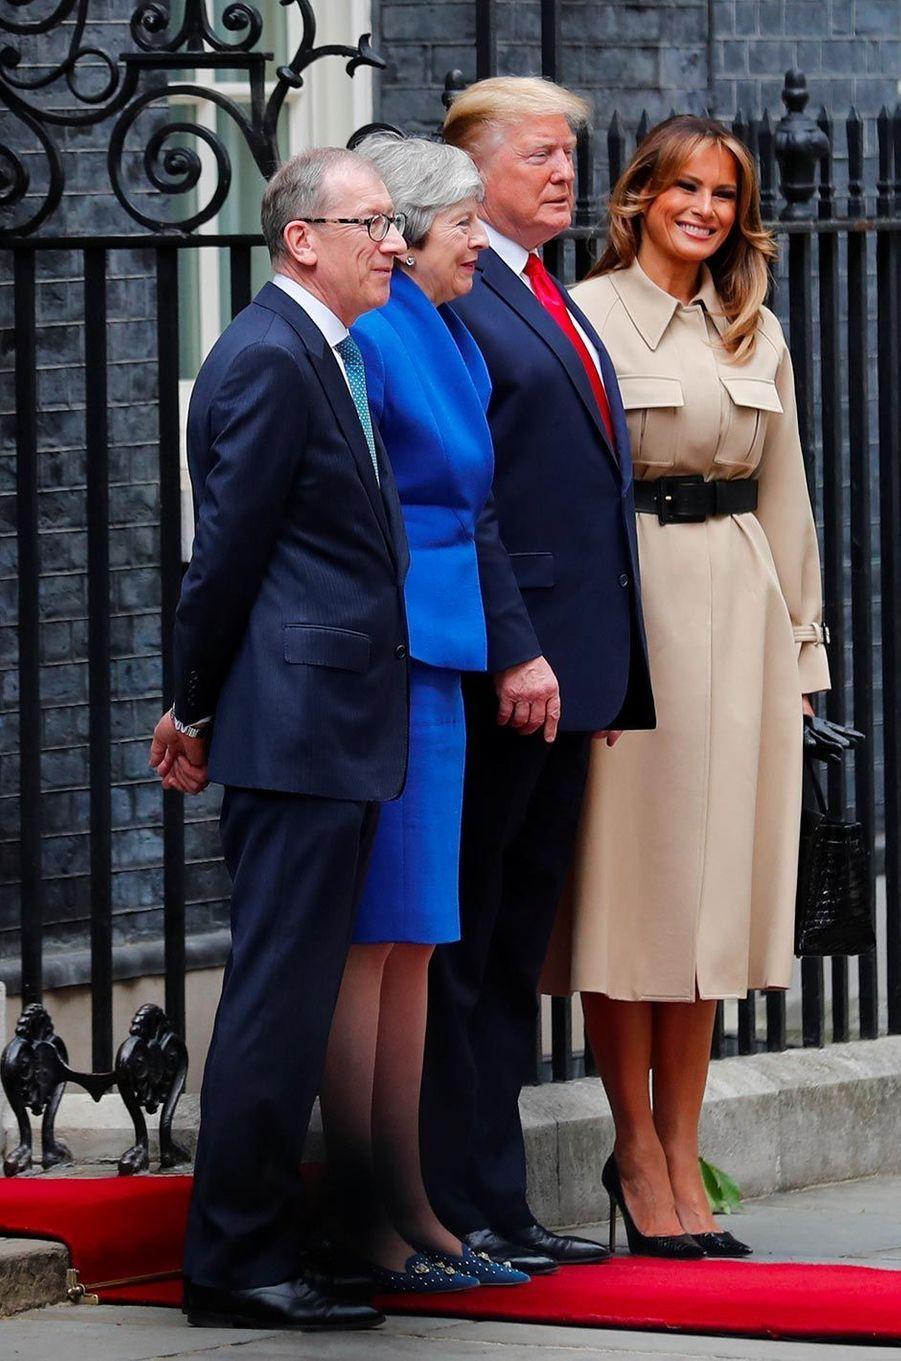 Melania Trump au 10 Downing Street, le 4 juin 2019.